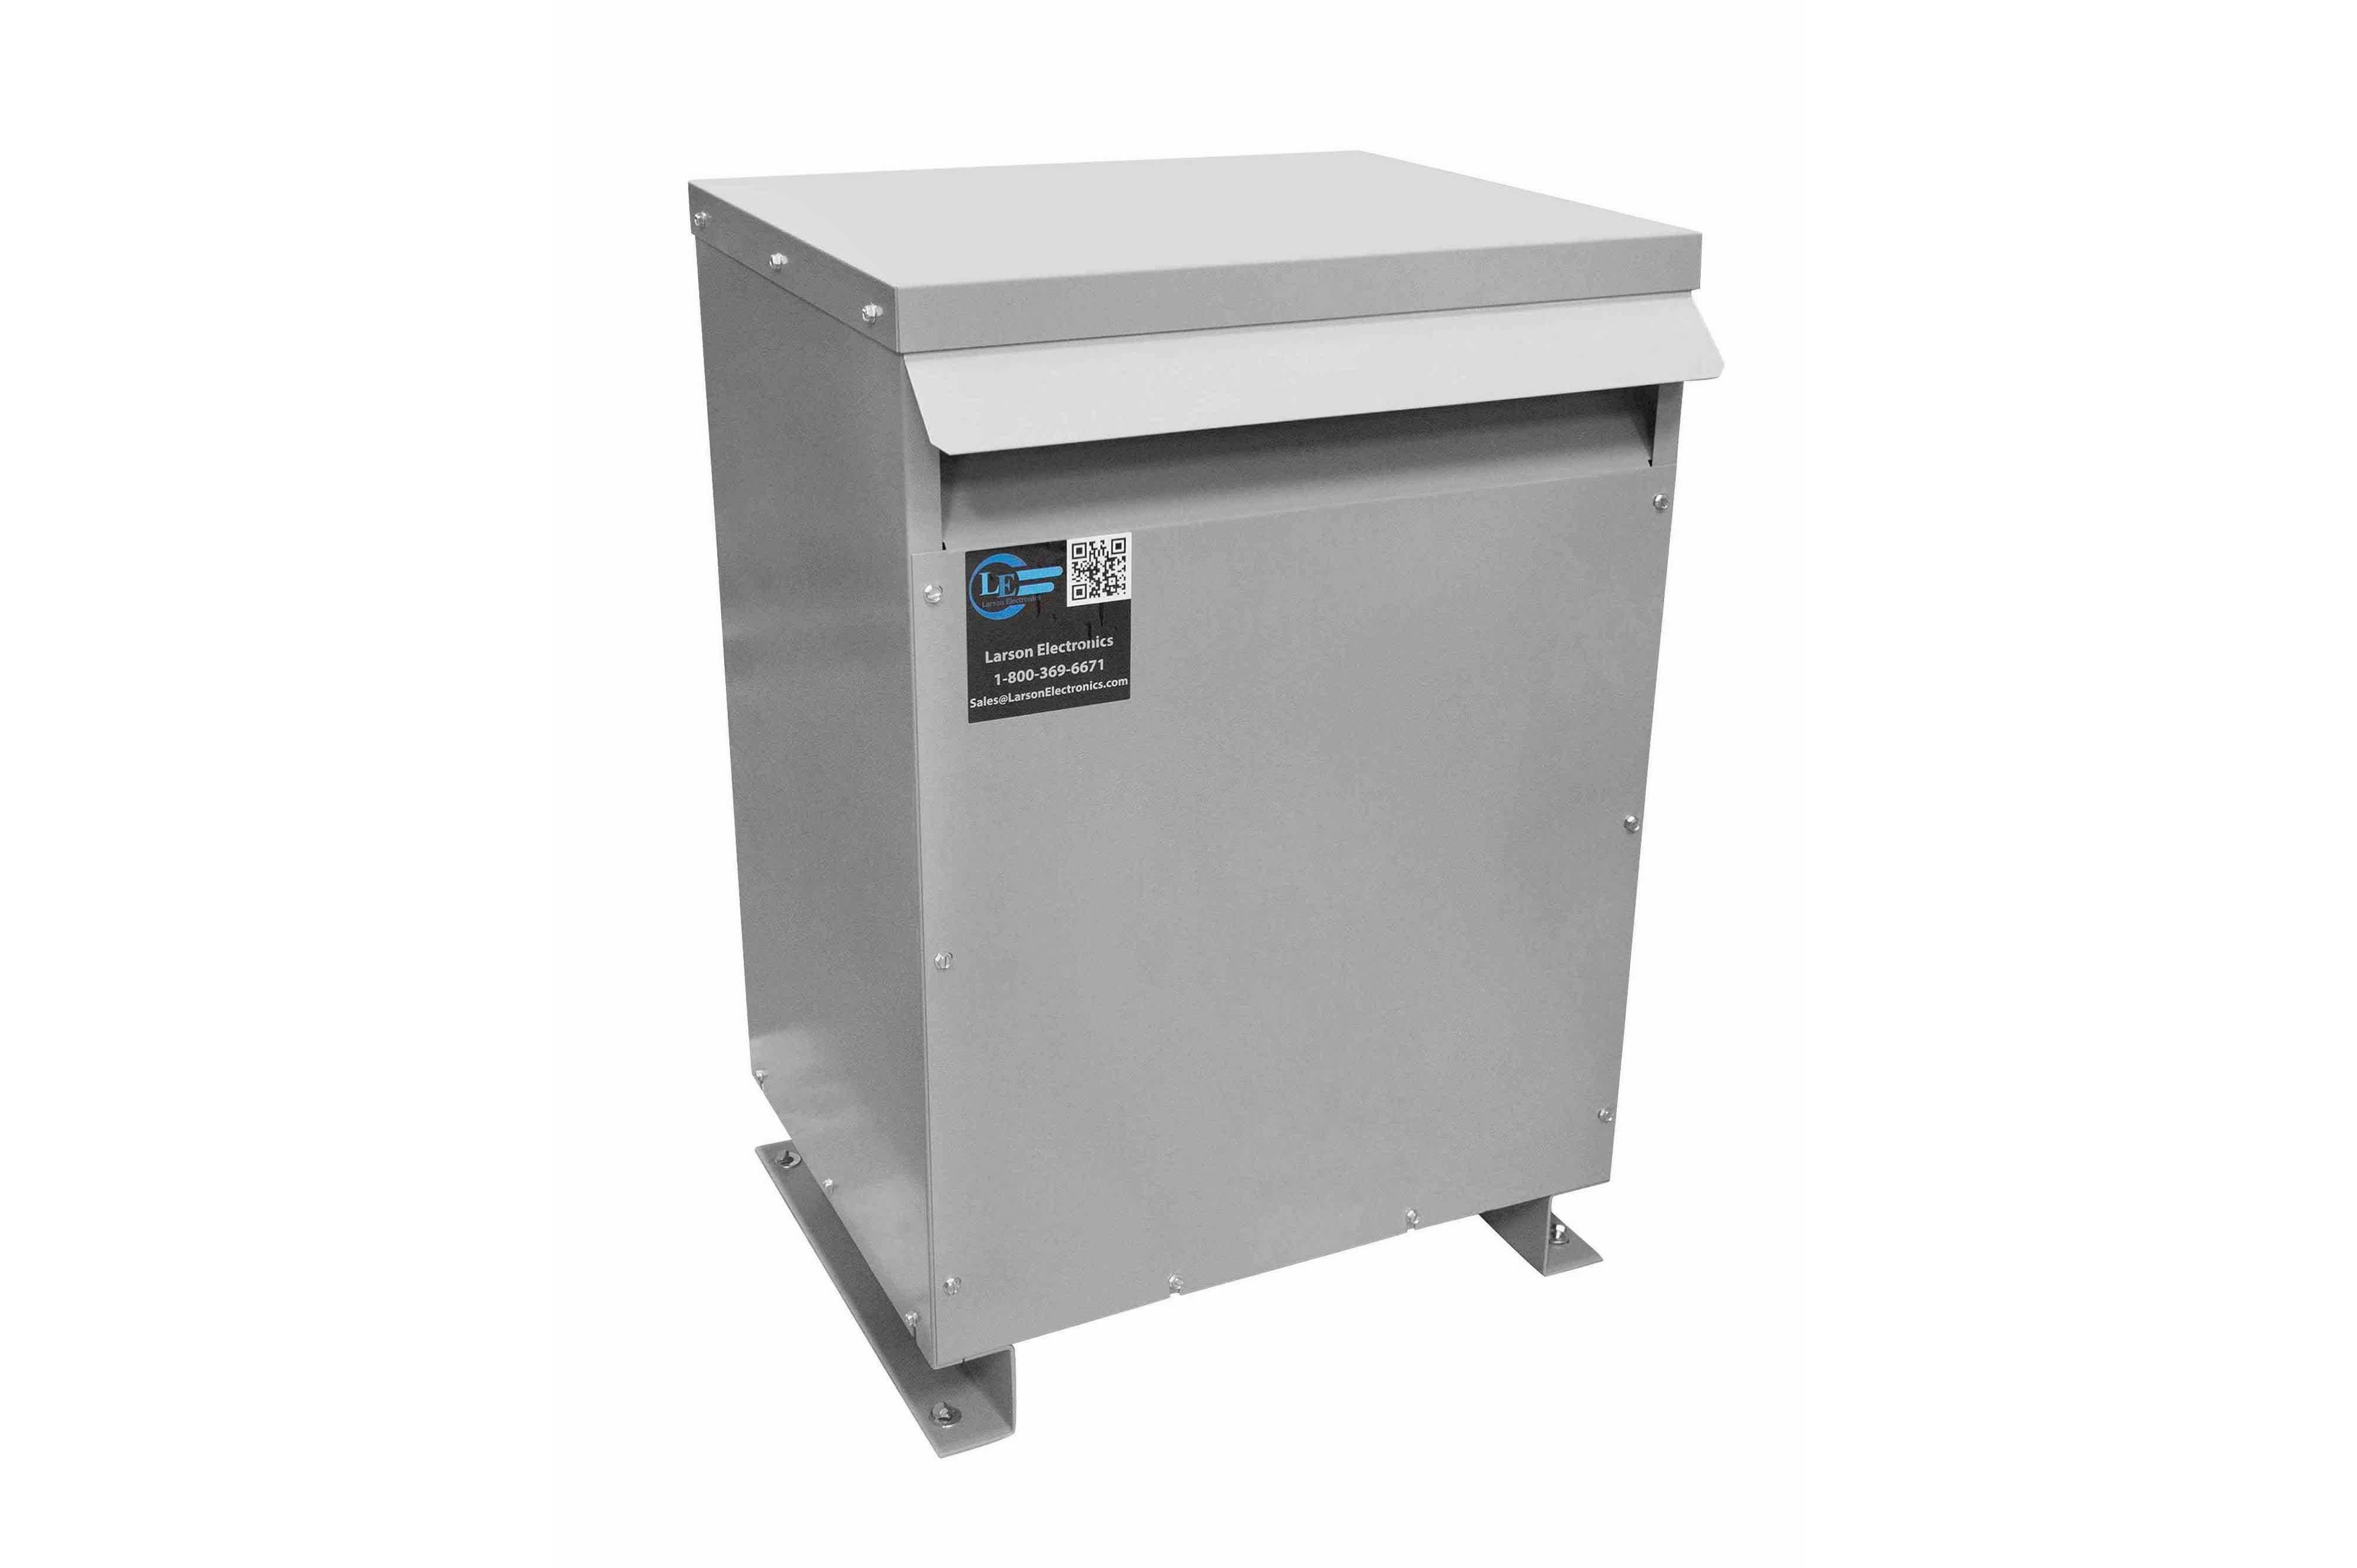 20 kVA 3PH Isolation Transformer, 208V Wye Primary, 208V Delta Secondary, N3R, Ventilated, 60 Hz